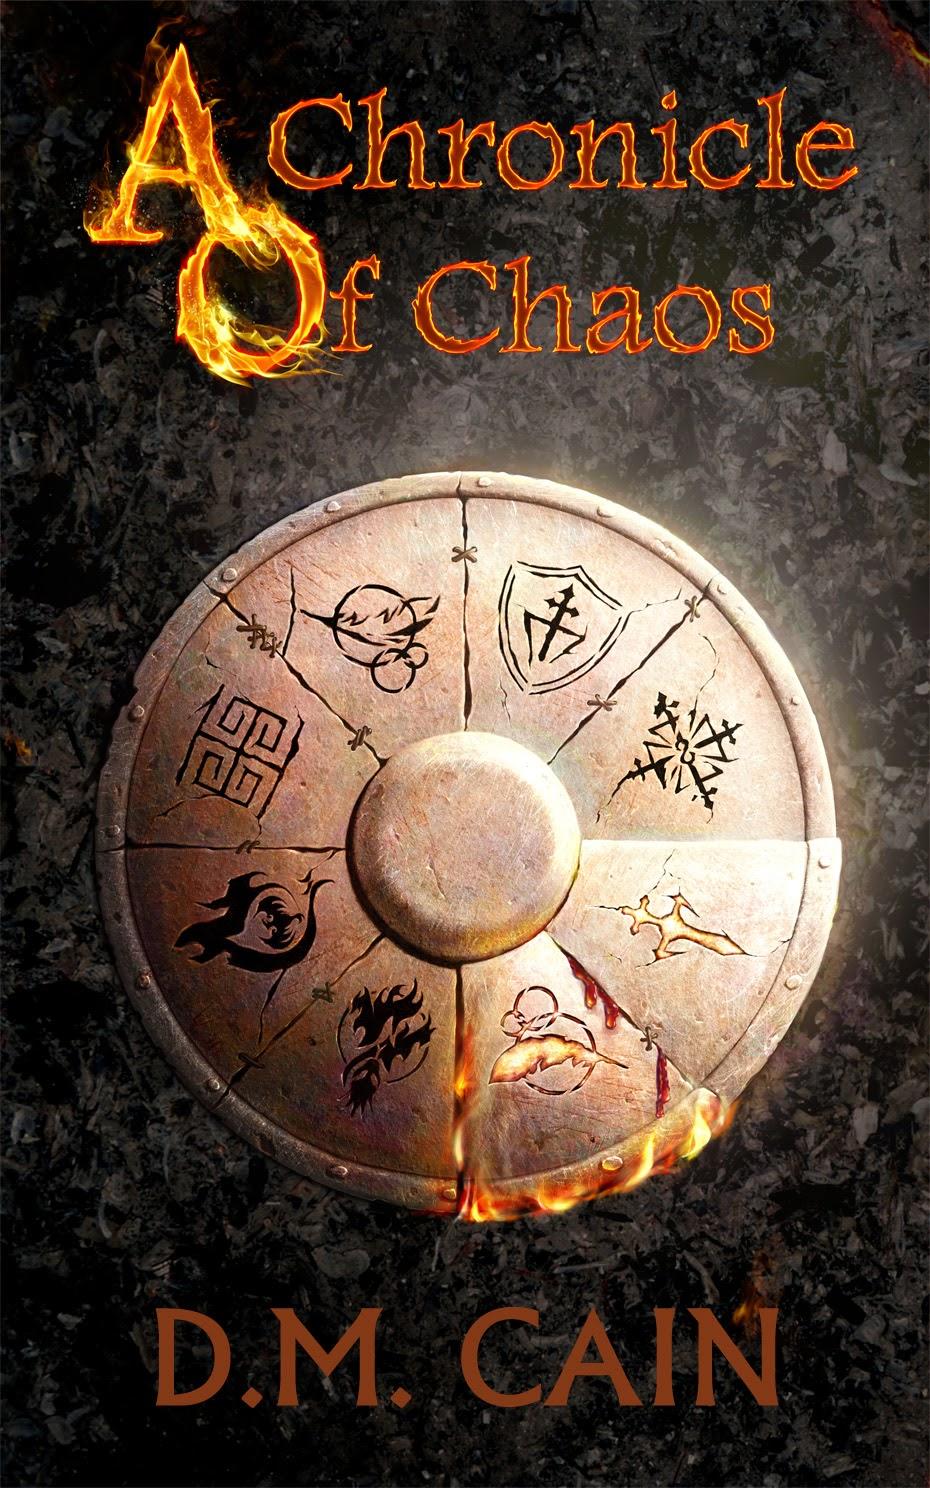 d.m. cain, chronicle of chaos, fantasy, demon, angel, novel